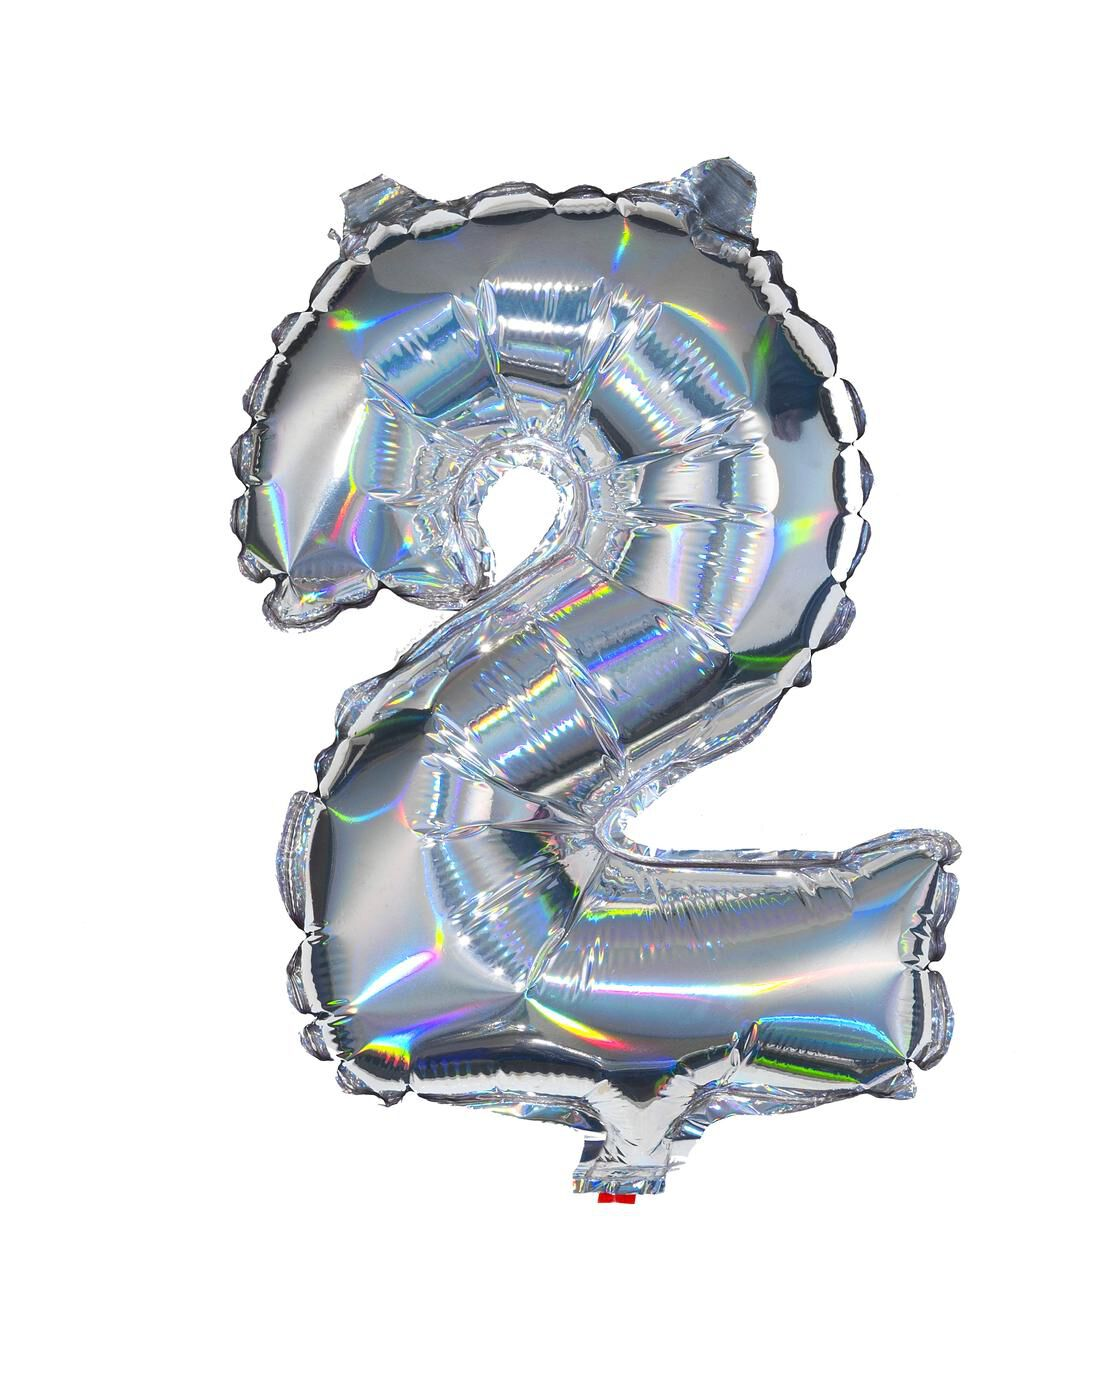 HEMA Folieballon 2 - Zilver (multicolor)